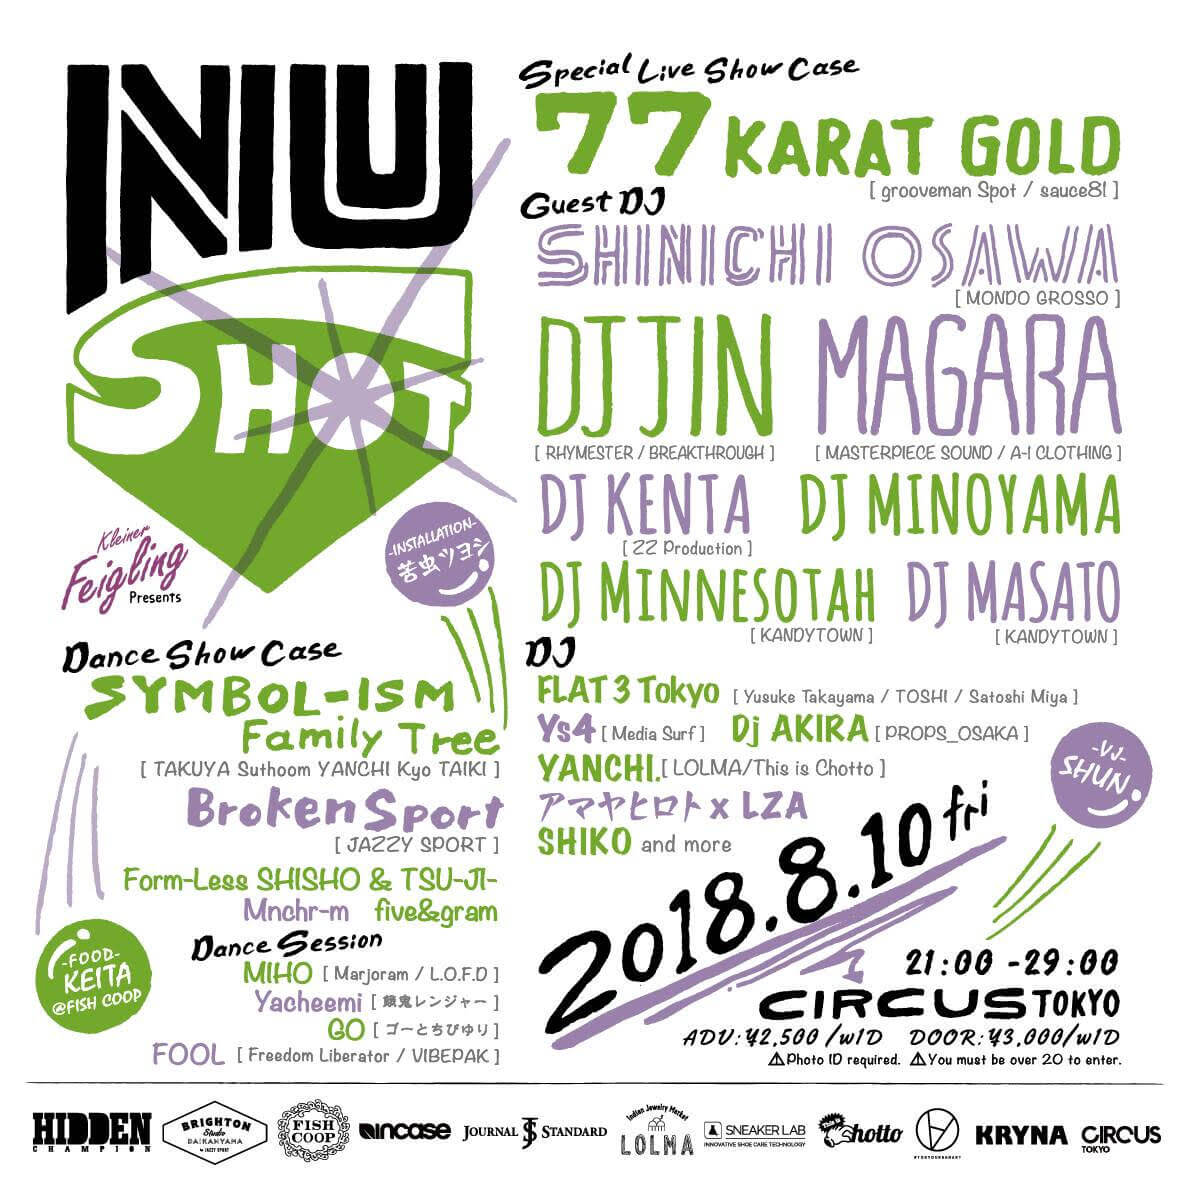 KANDYTOWNのメンバーや大沢伸一らが登場!アートや音楽、ダンスにフードが癒合する新イベントがスタートサムネイル画像